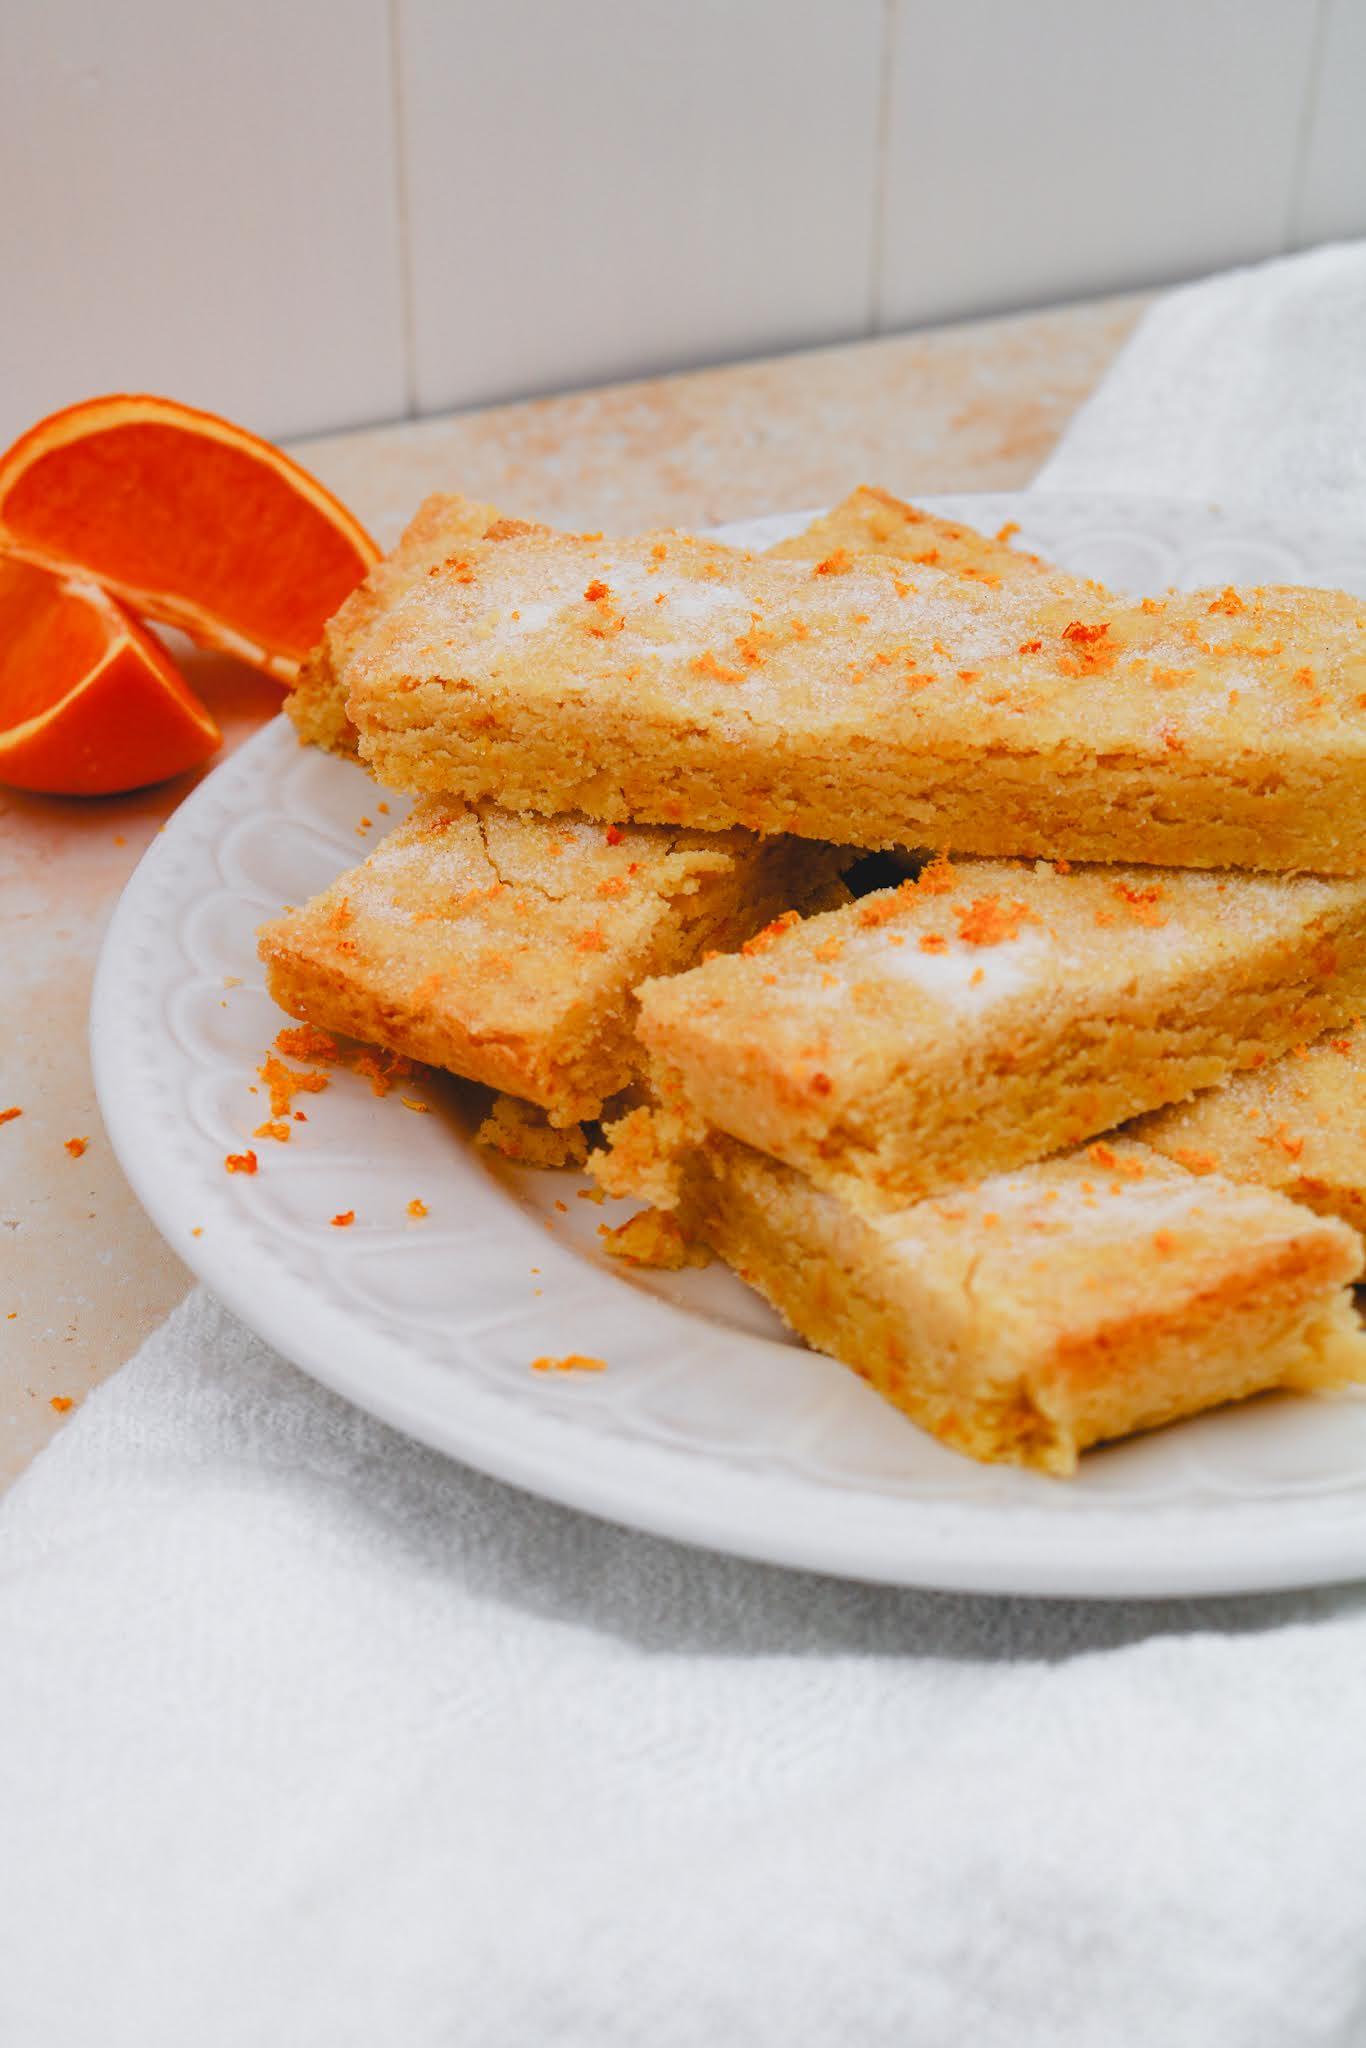 Small Batch Orange Shortbread | Take Some Whisks